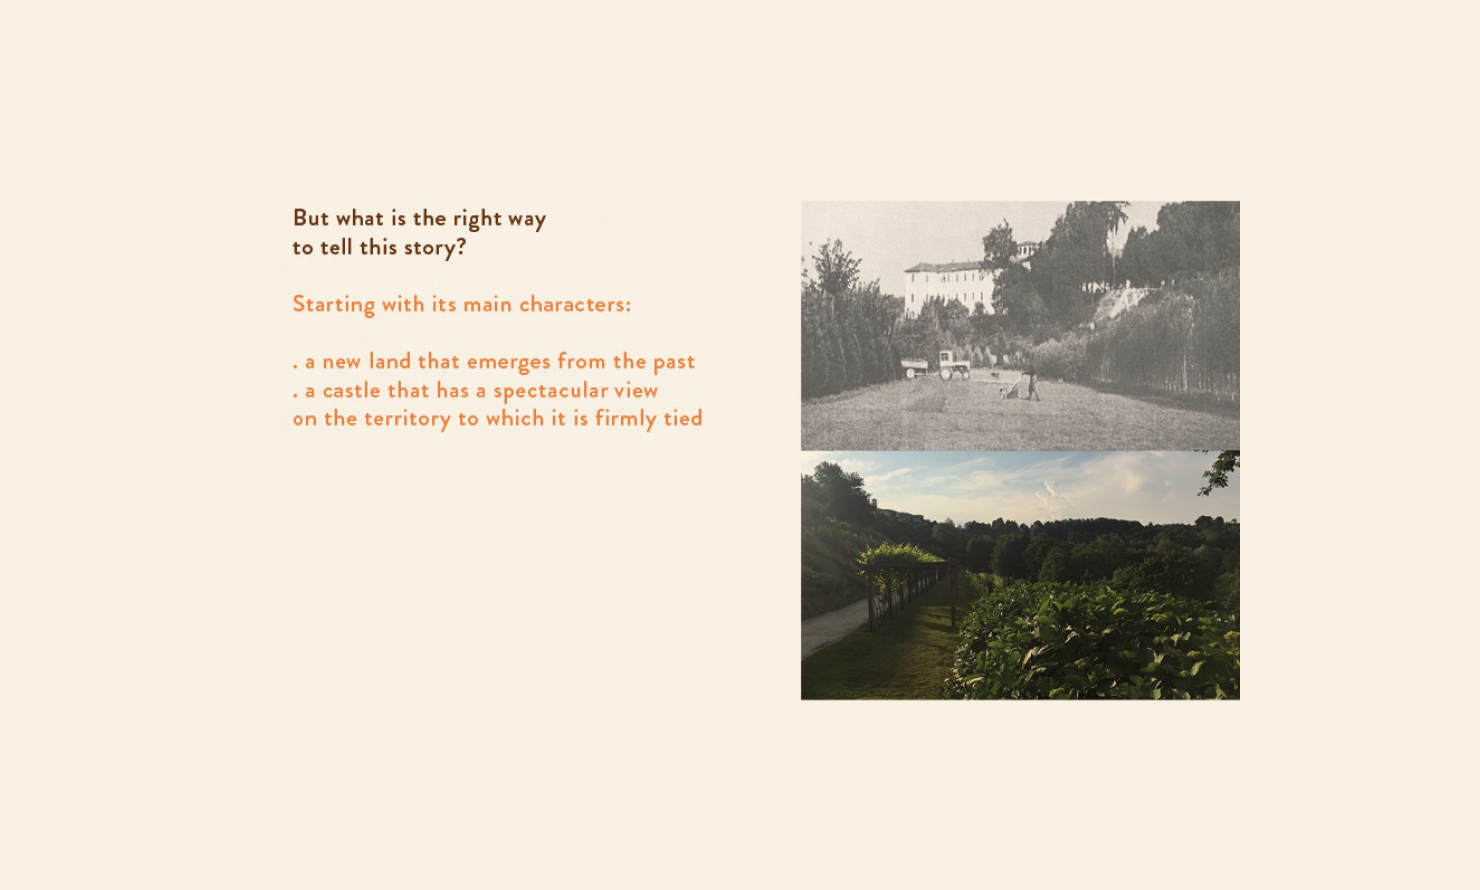 https://kubelibre.com/uploads/Slider-work-tutti-clienti/manital-vistaterra-l-agriparco-che-abbraccia-il-castello-brand-identity-brand-strategy-3.jpg